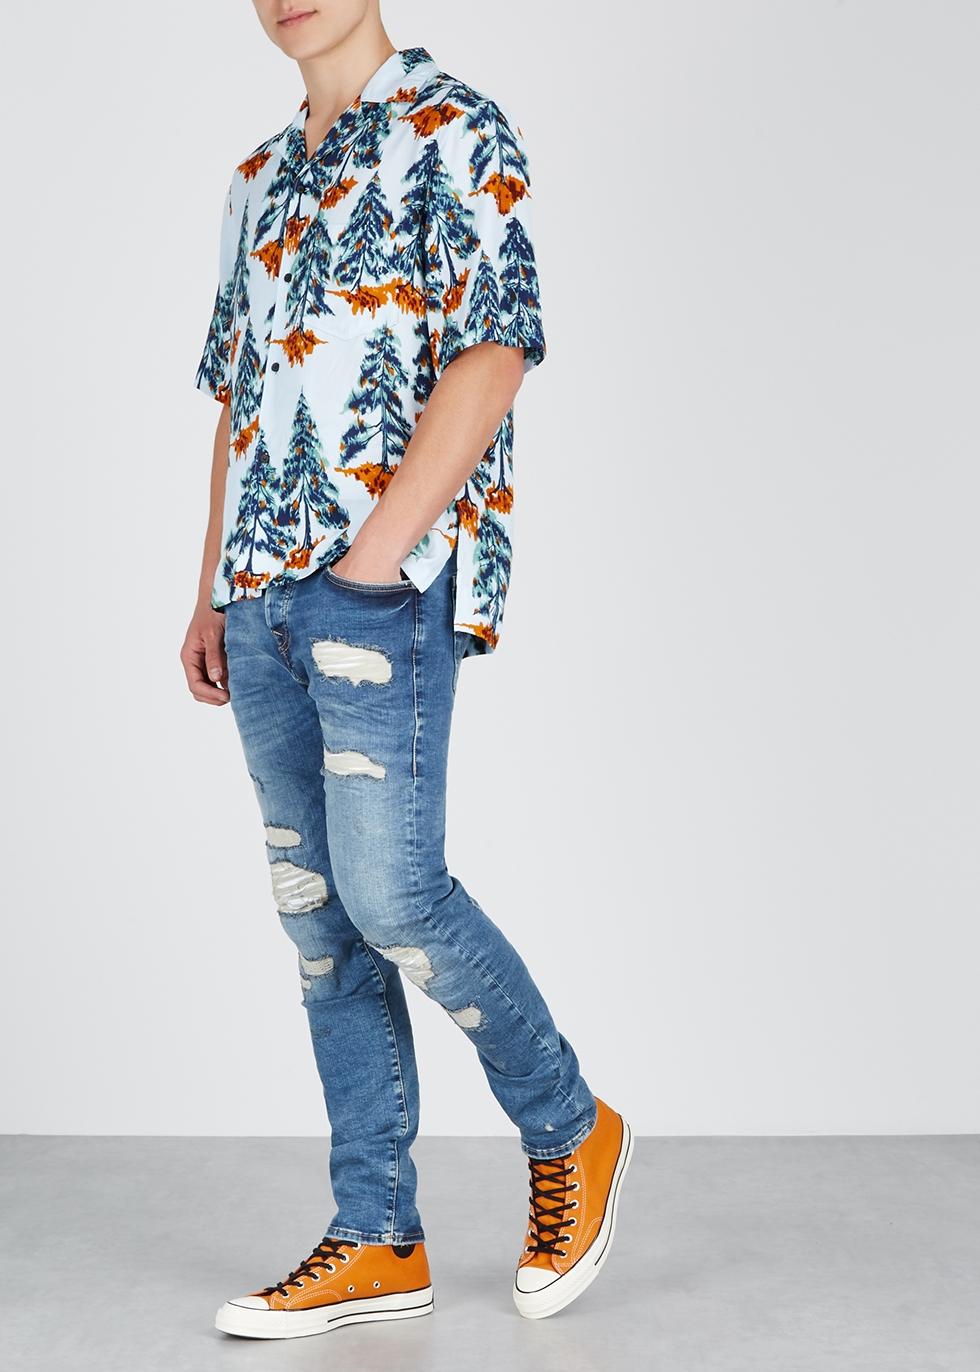 Rocco distressed skinny jeans - True Religion